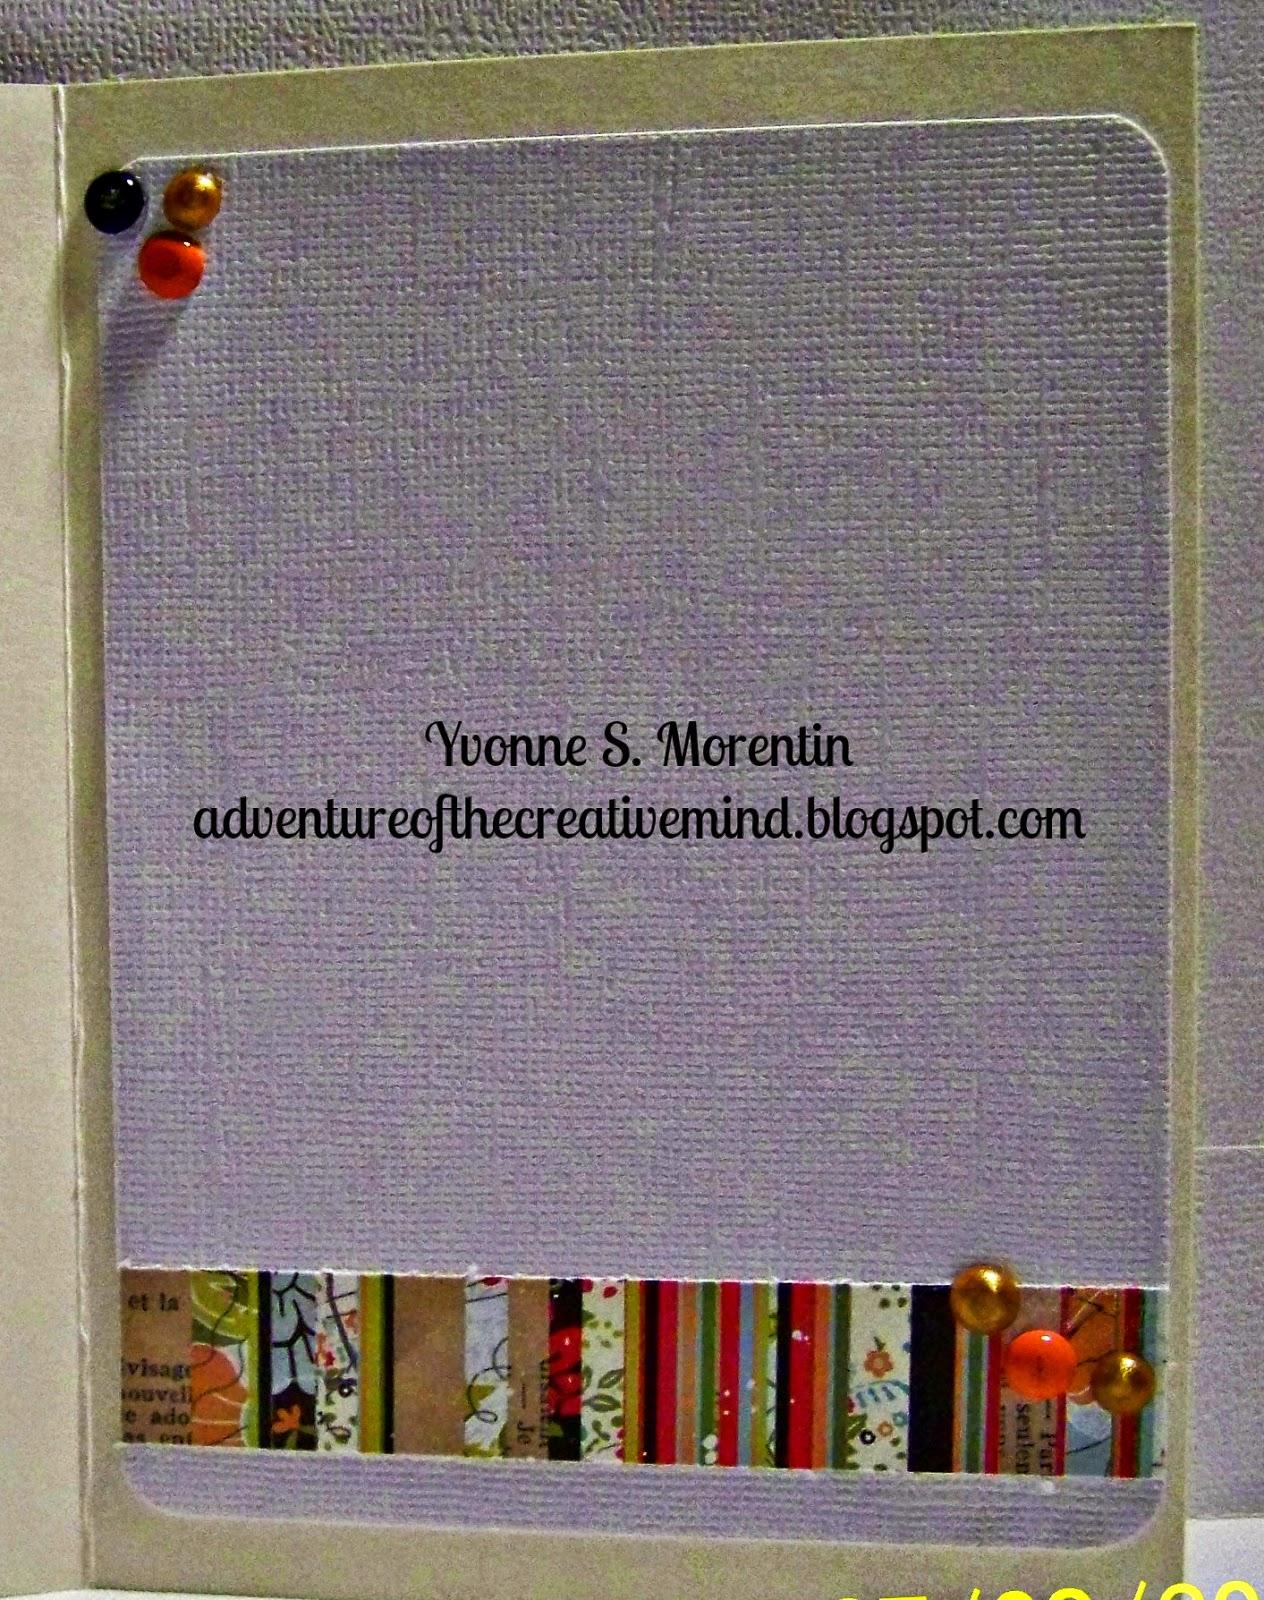 Yvonne S. Morentin - http://adventureofthecreativemind.blogspot.com/